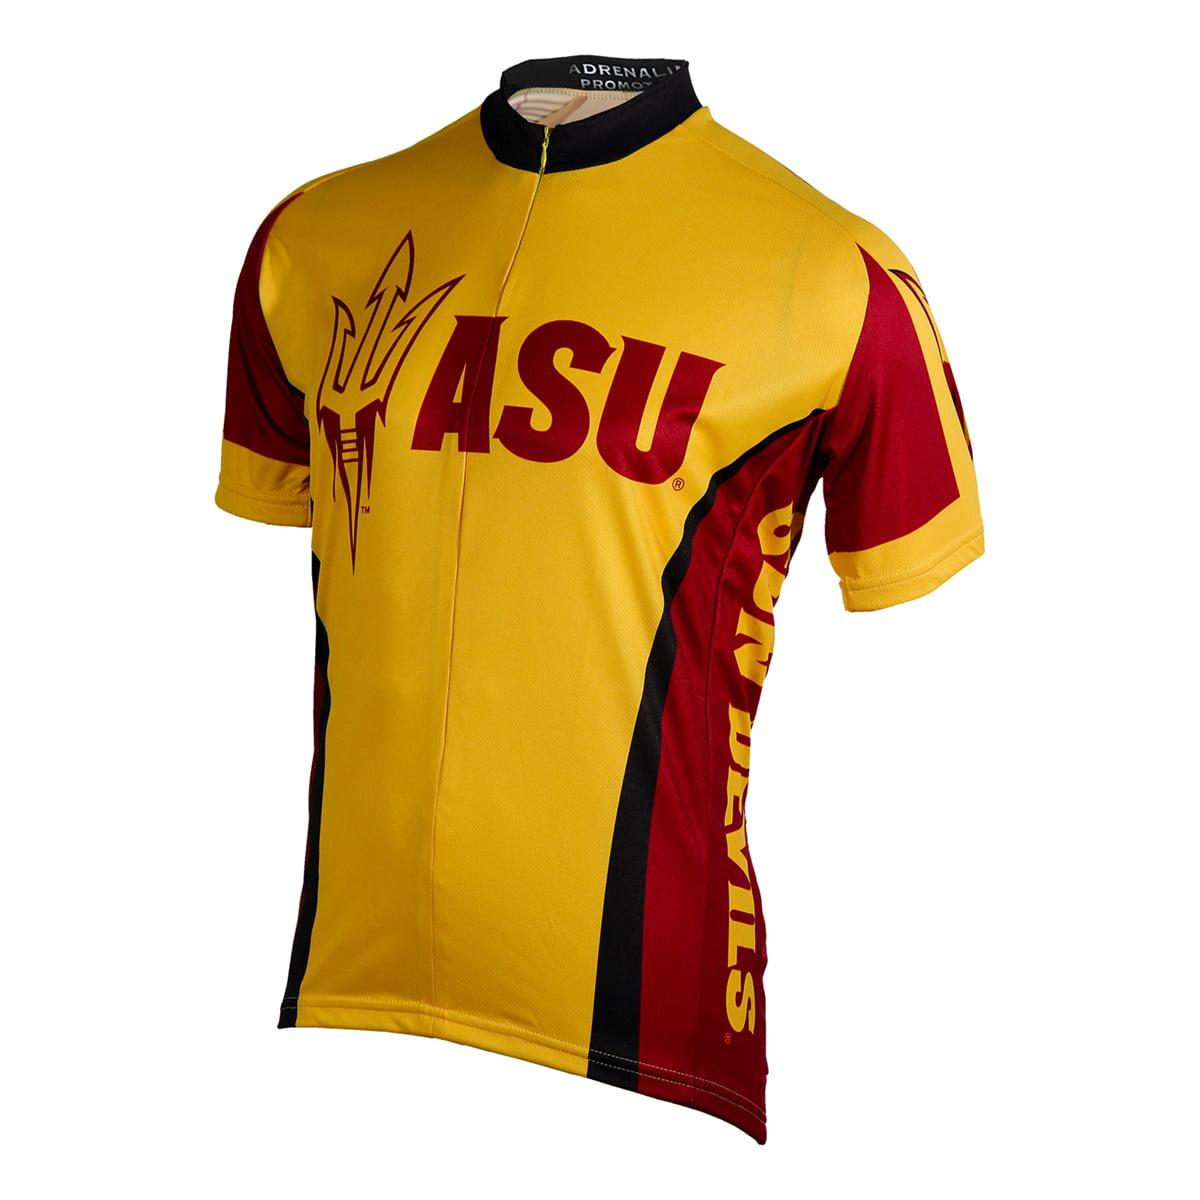 Image of Adrenaline Promotions Arizona State University Sun Devils Cycling Jersey